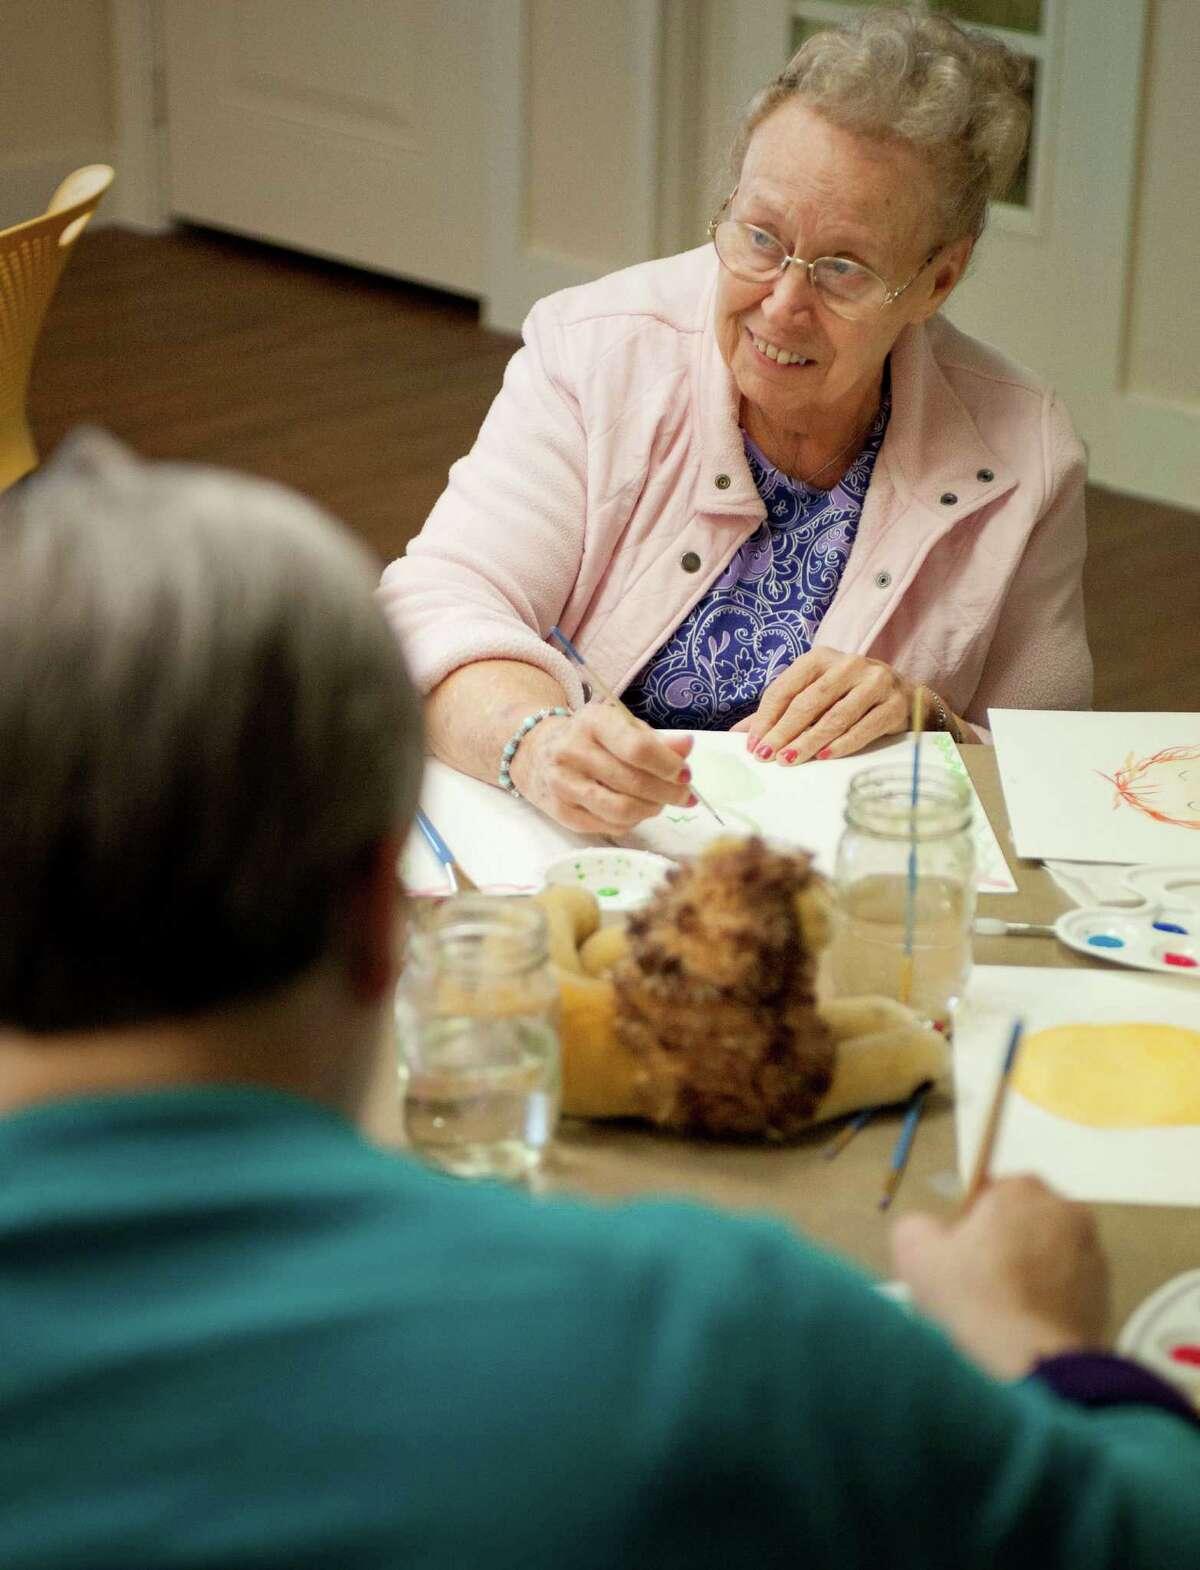 Doris Maynard, right, paints during a memory art class, Monday, June 4, 2012, at Franklin Park in San Antonio. (Darren Abate/Express-News)